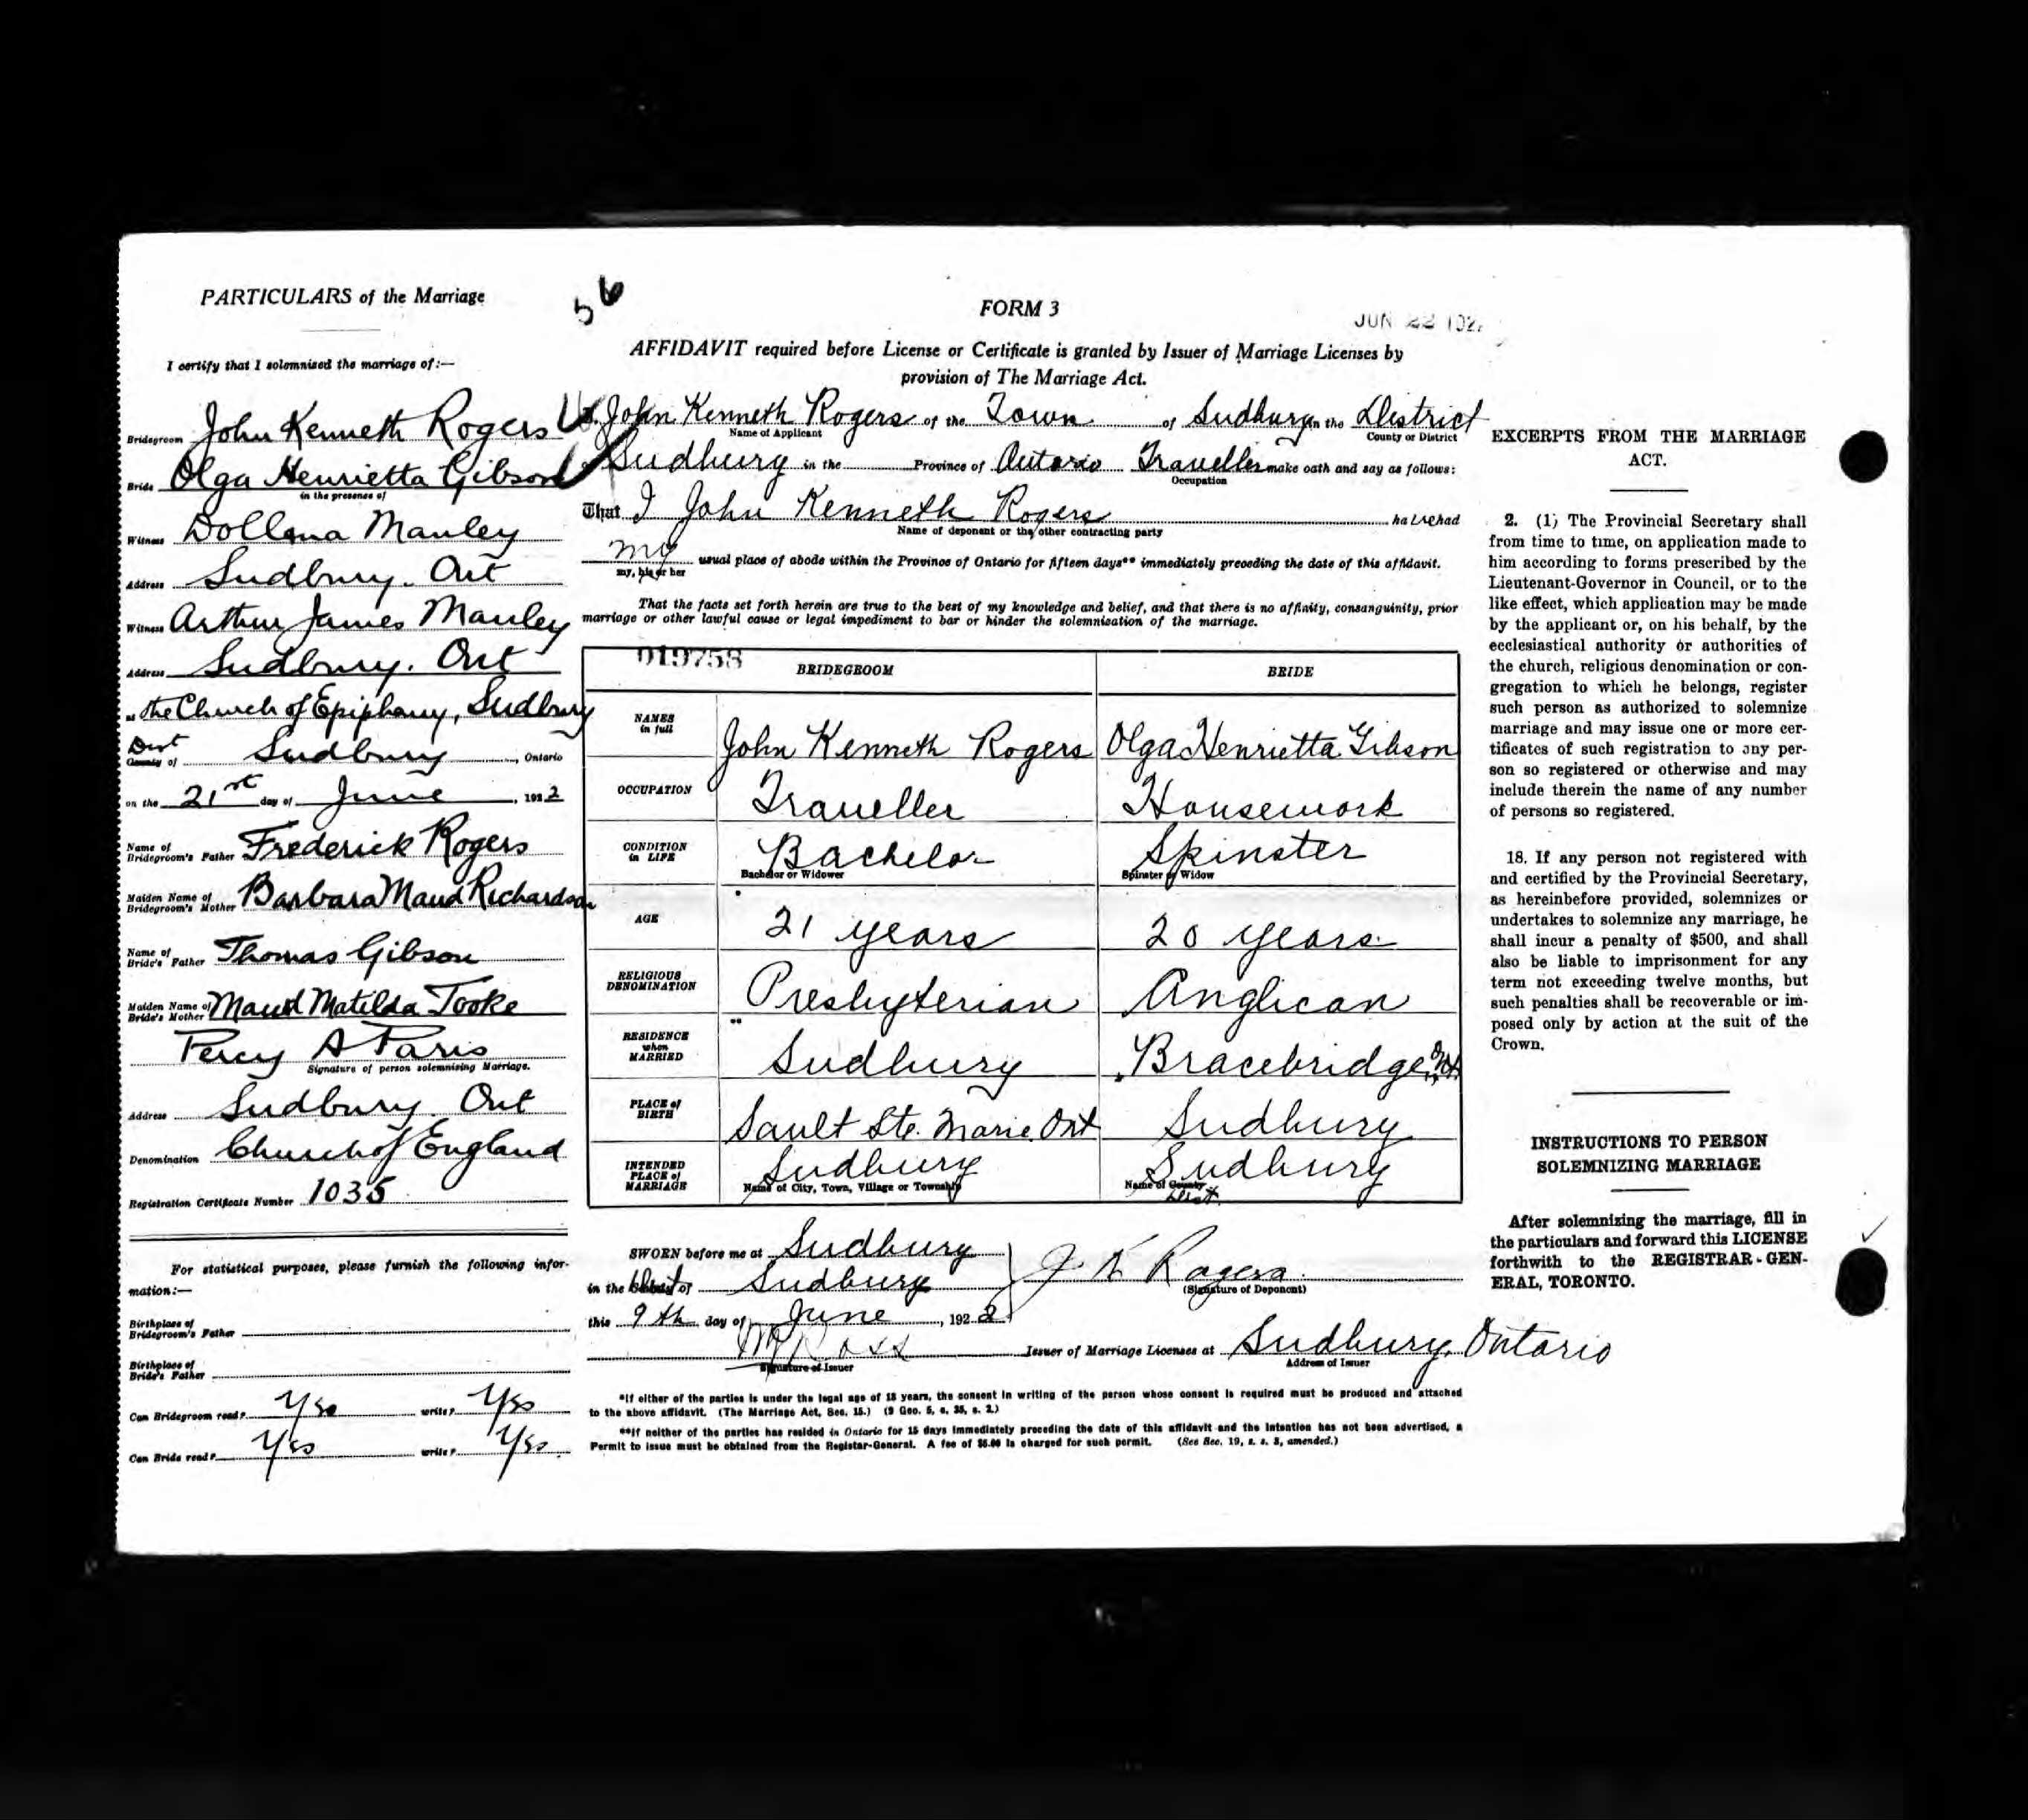 1922 Olga Henrietta Gibson Marriage Certificate